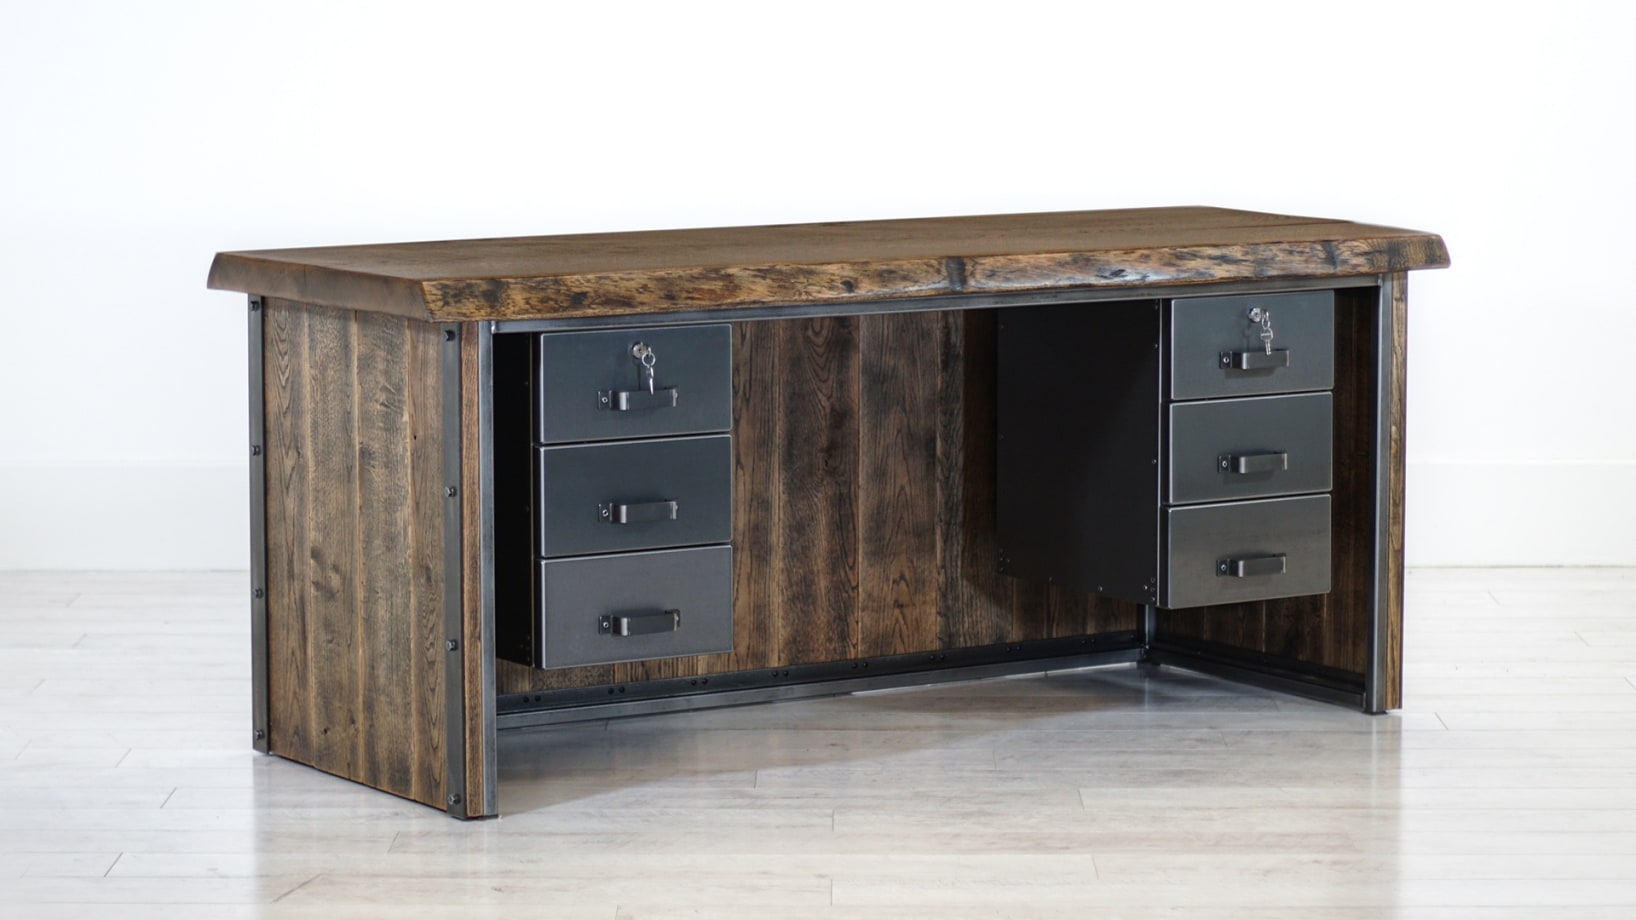 Steel Vintage oak desk with built in drawers